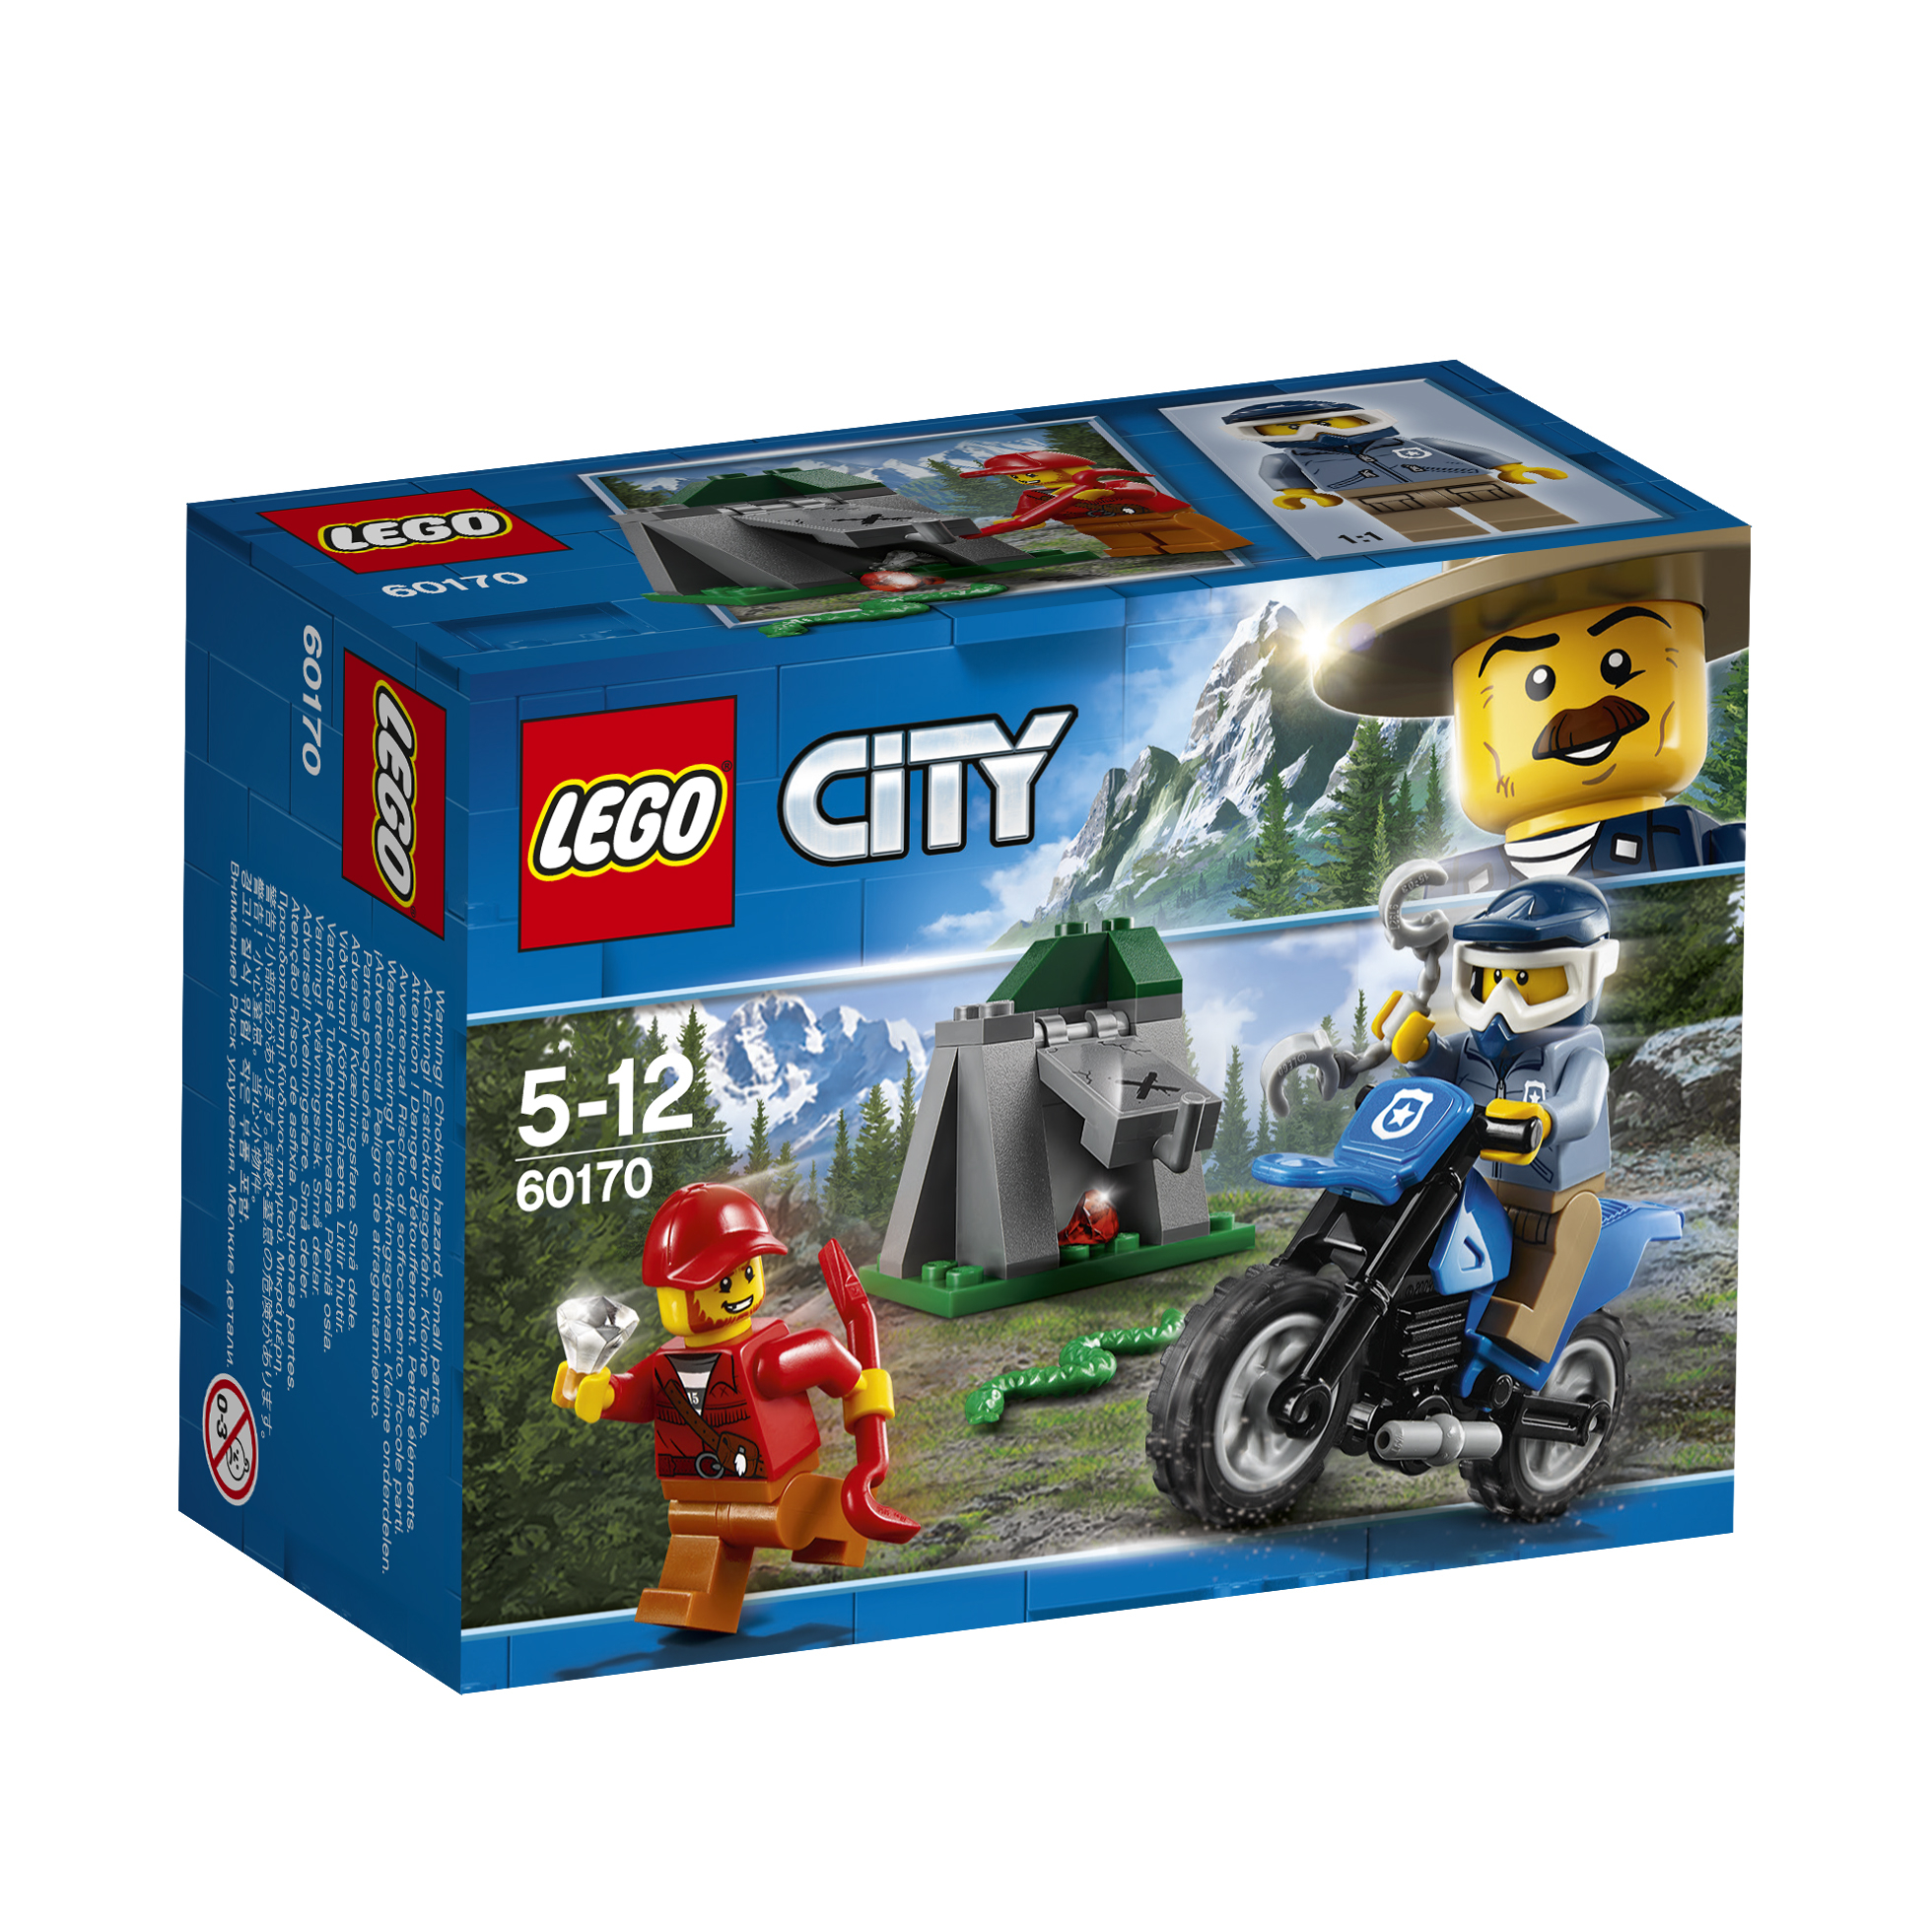 Конструктор LEGO City Police 60170 Погоня на внедорожниках model building kits compatible with lego city police car boat water patrolcity 3d blocks educational model building toys hobbies